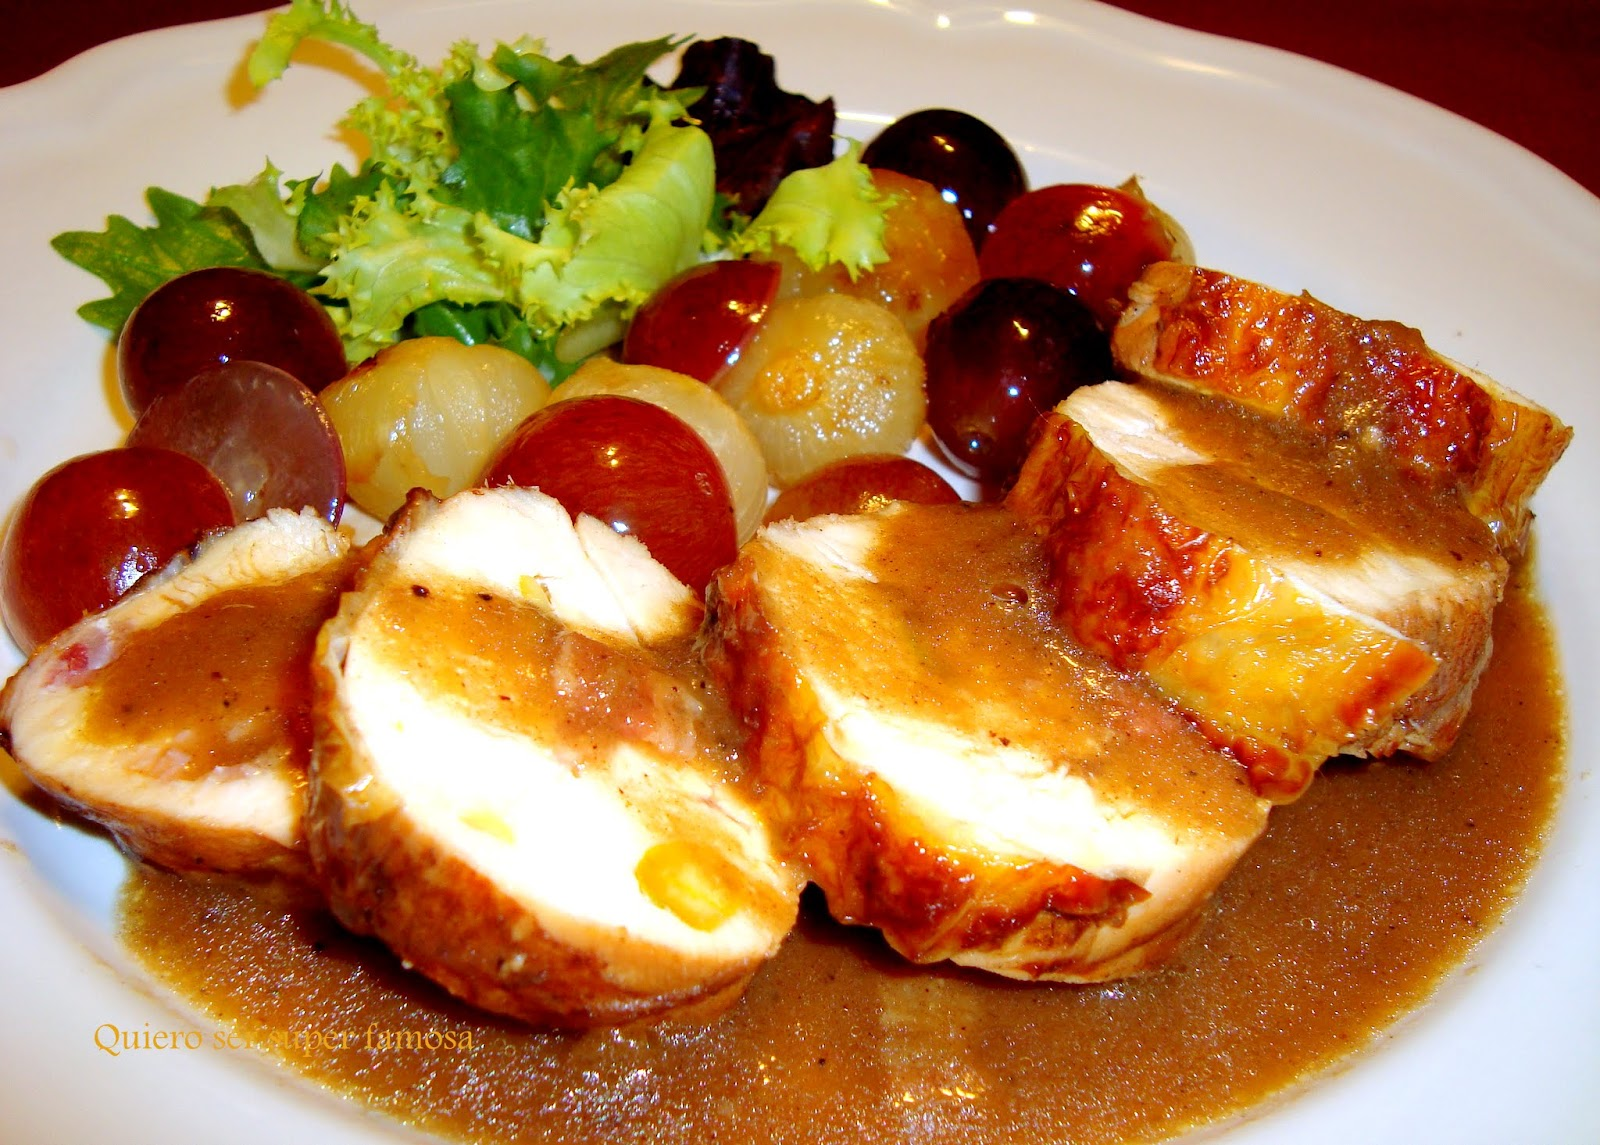 Quiero ser s per famosa pechuga de pollo con salsa de uvas moradas - Salsas para pechuga de pollo ...